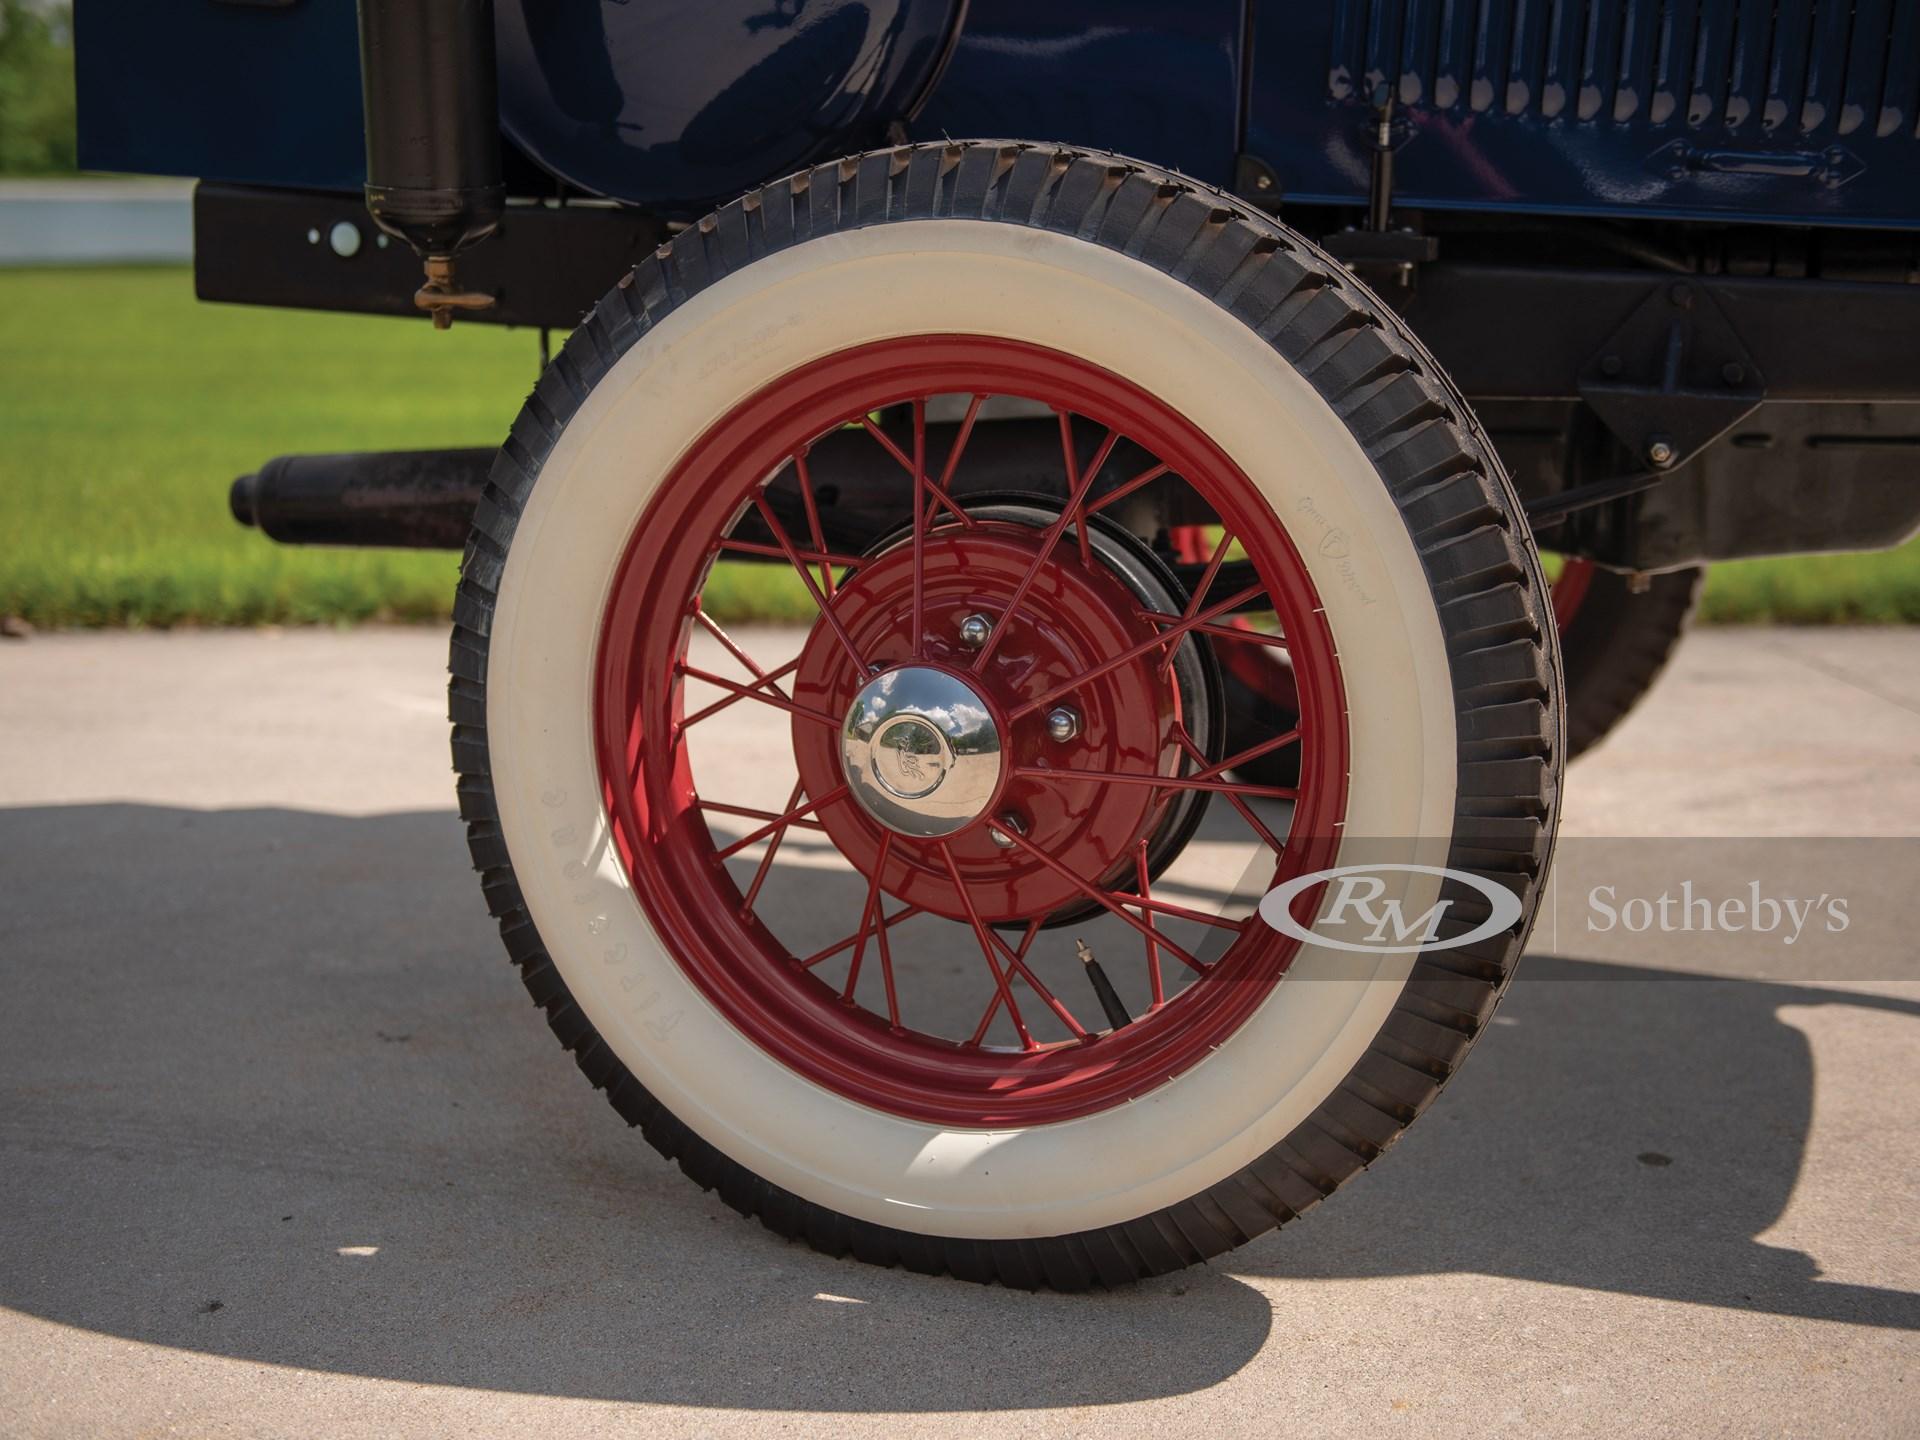 Ford Model A Air Compressor by Gordon Smith & Co. -